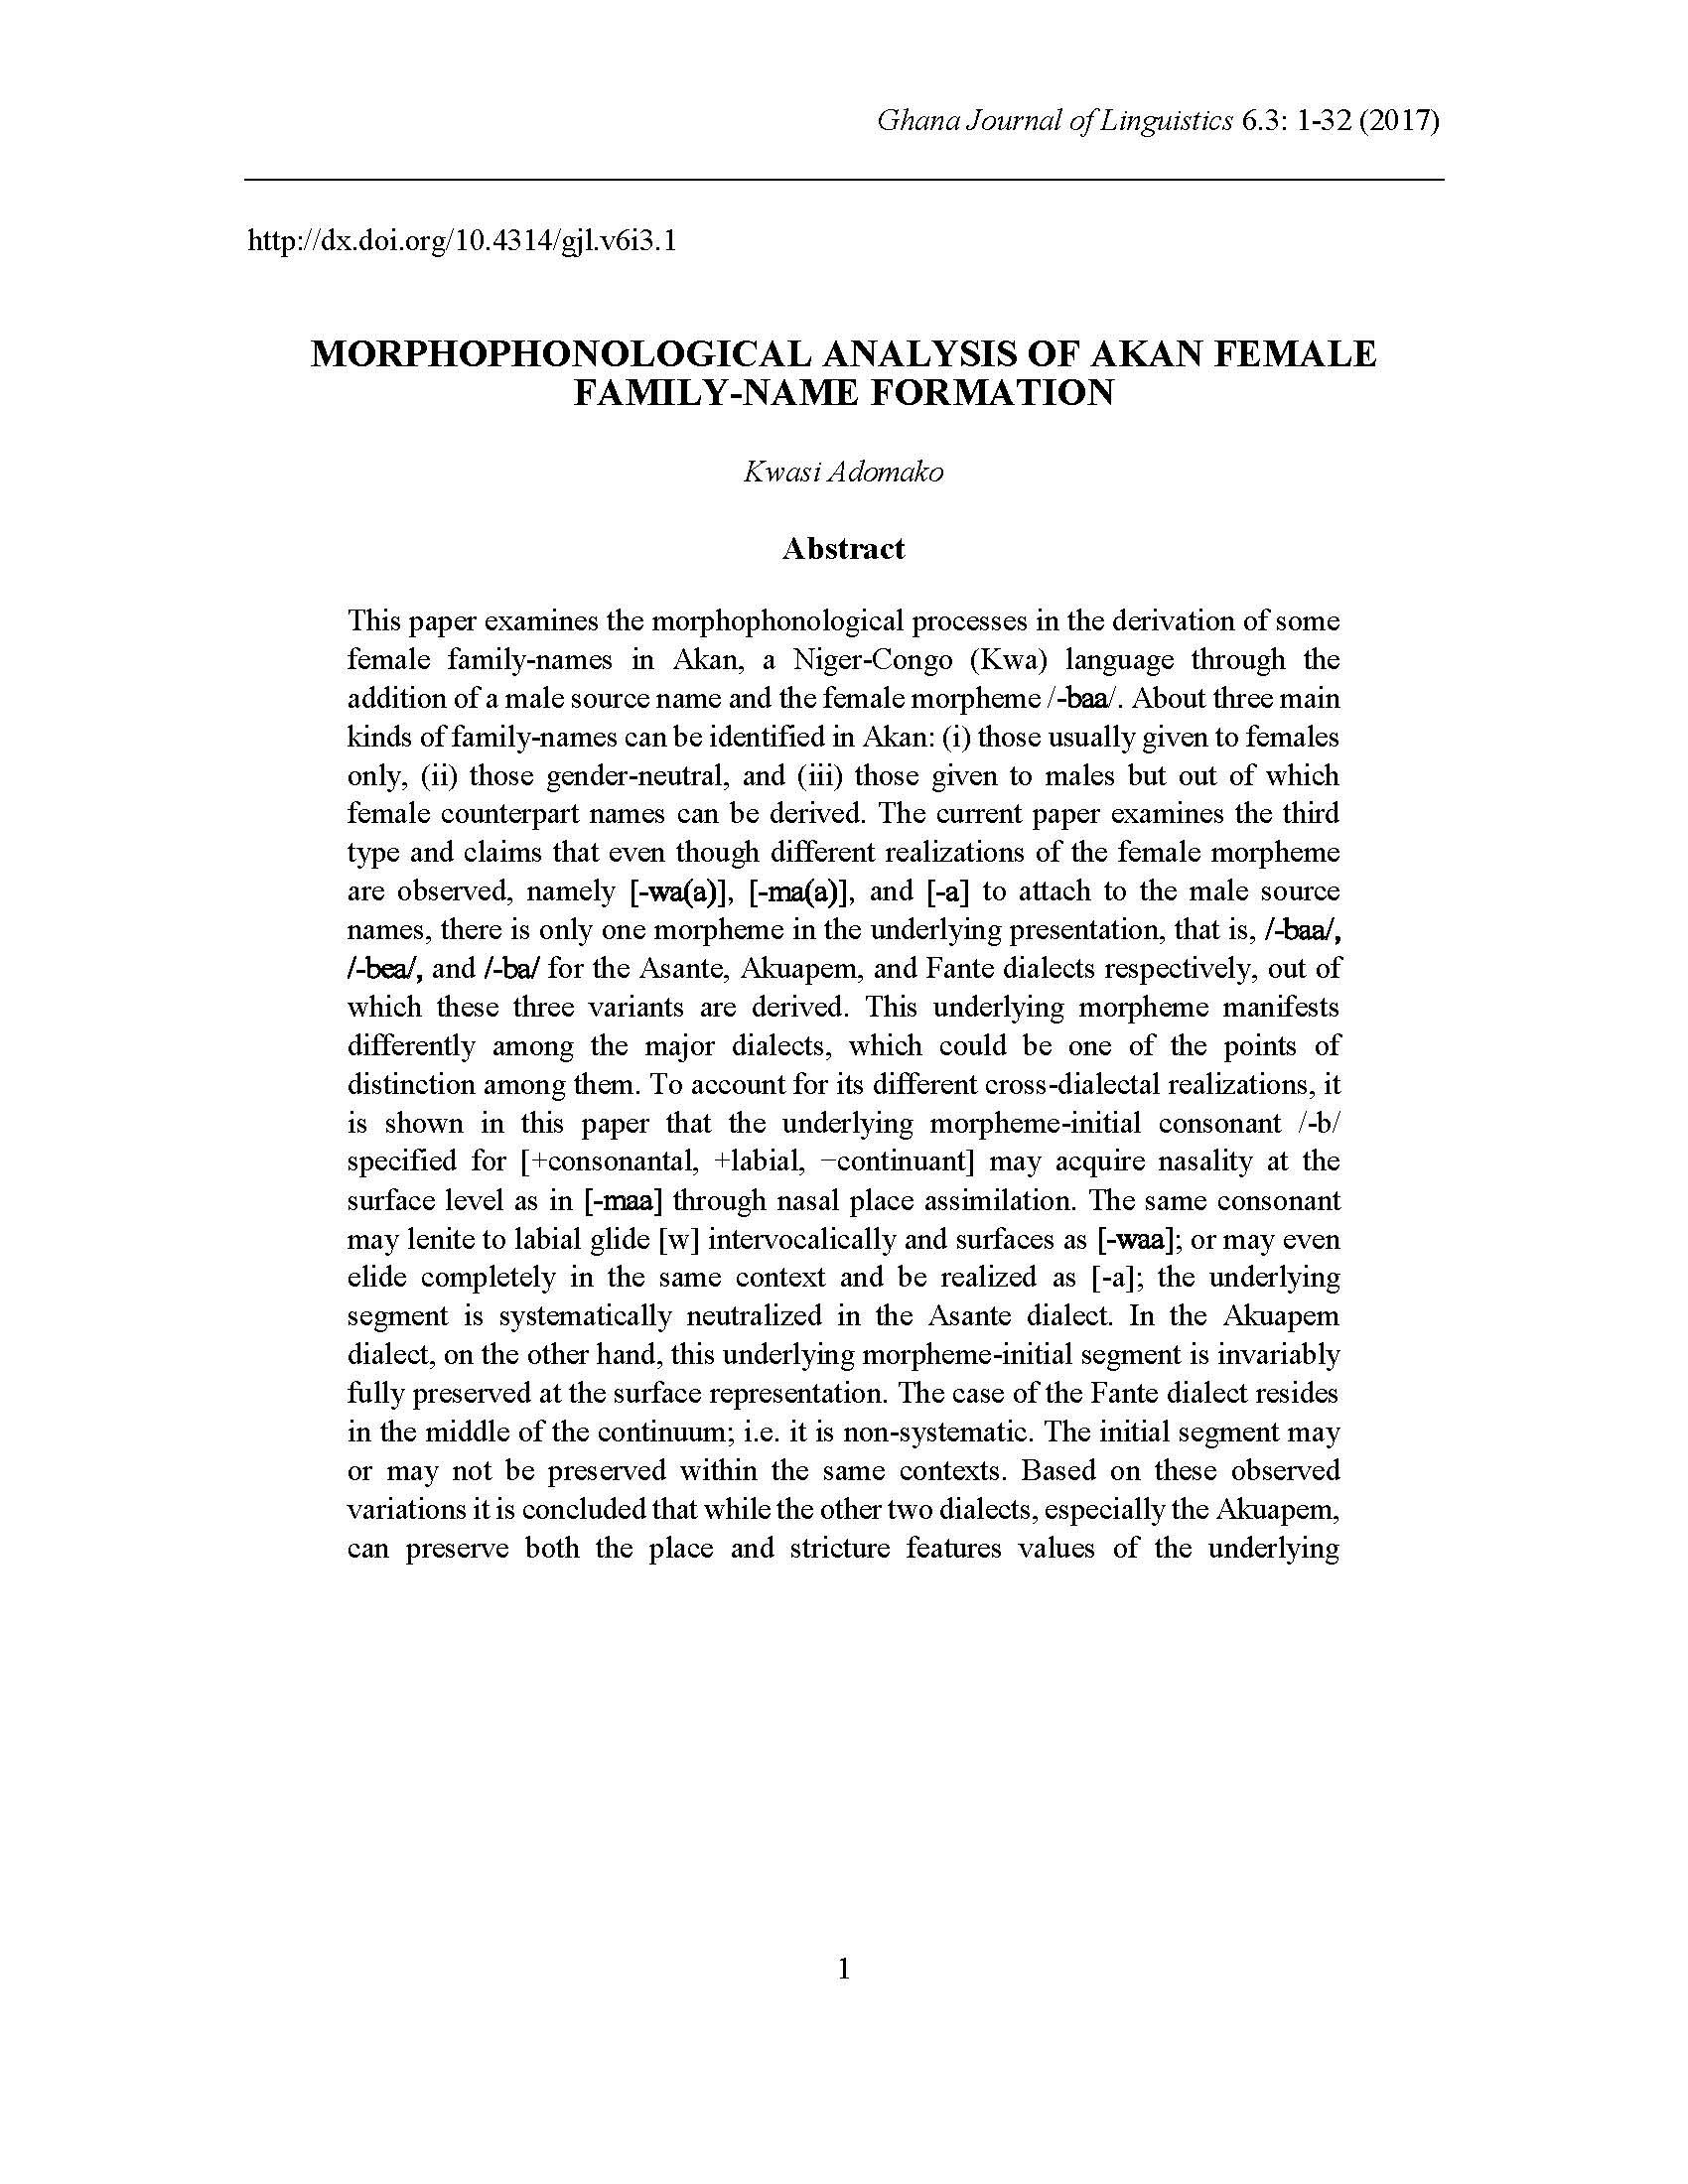 Kwasi Adomako - MORPHOPHONOLOGICAL ANALYSIS OF AKAN FEMALE FAMILY-NAME FORMATION